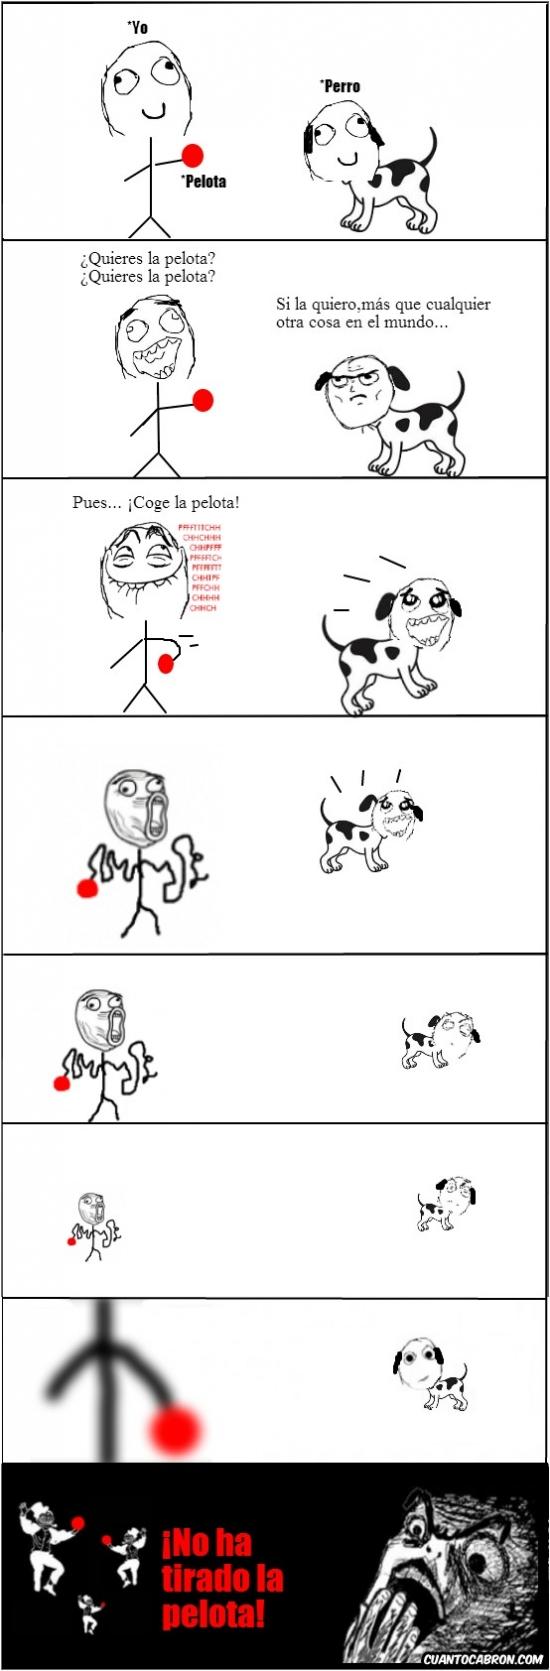 engañar,lol,pelota,perro,tirar,troll